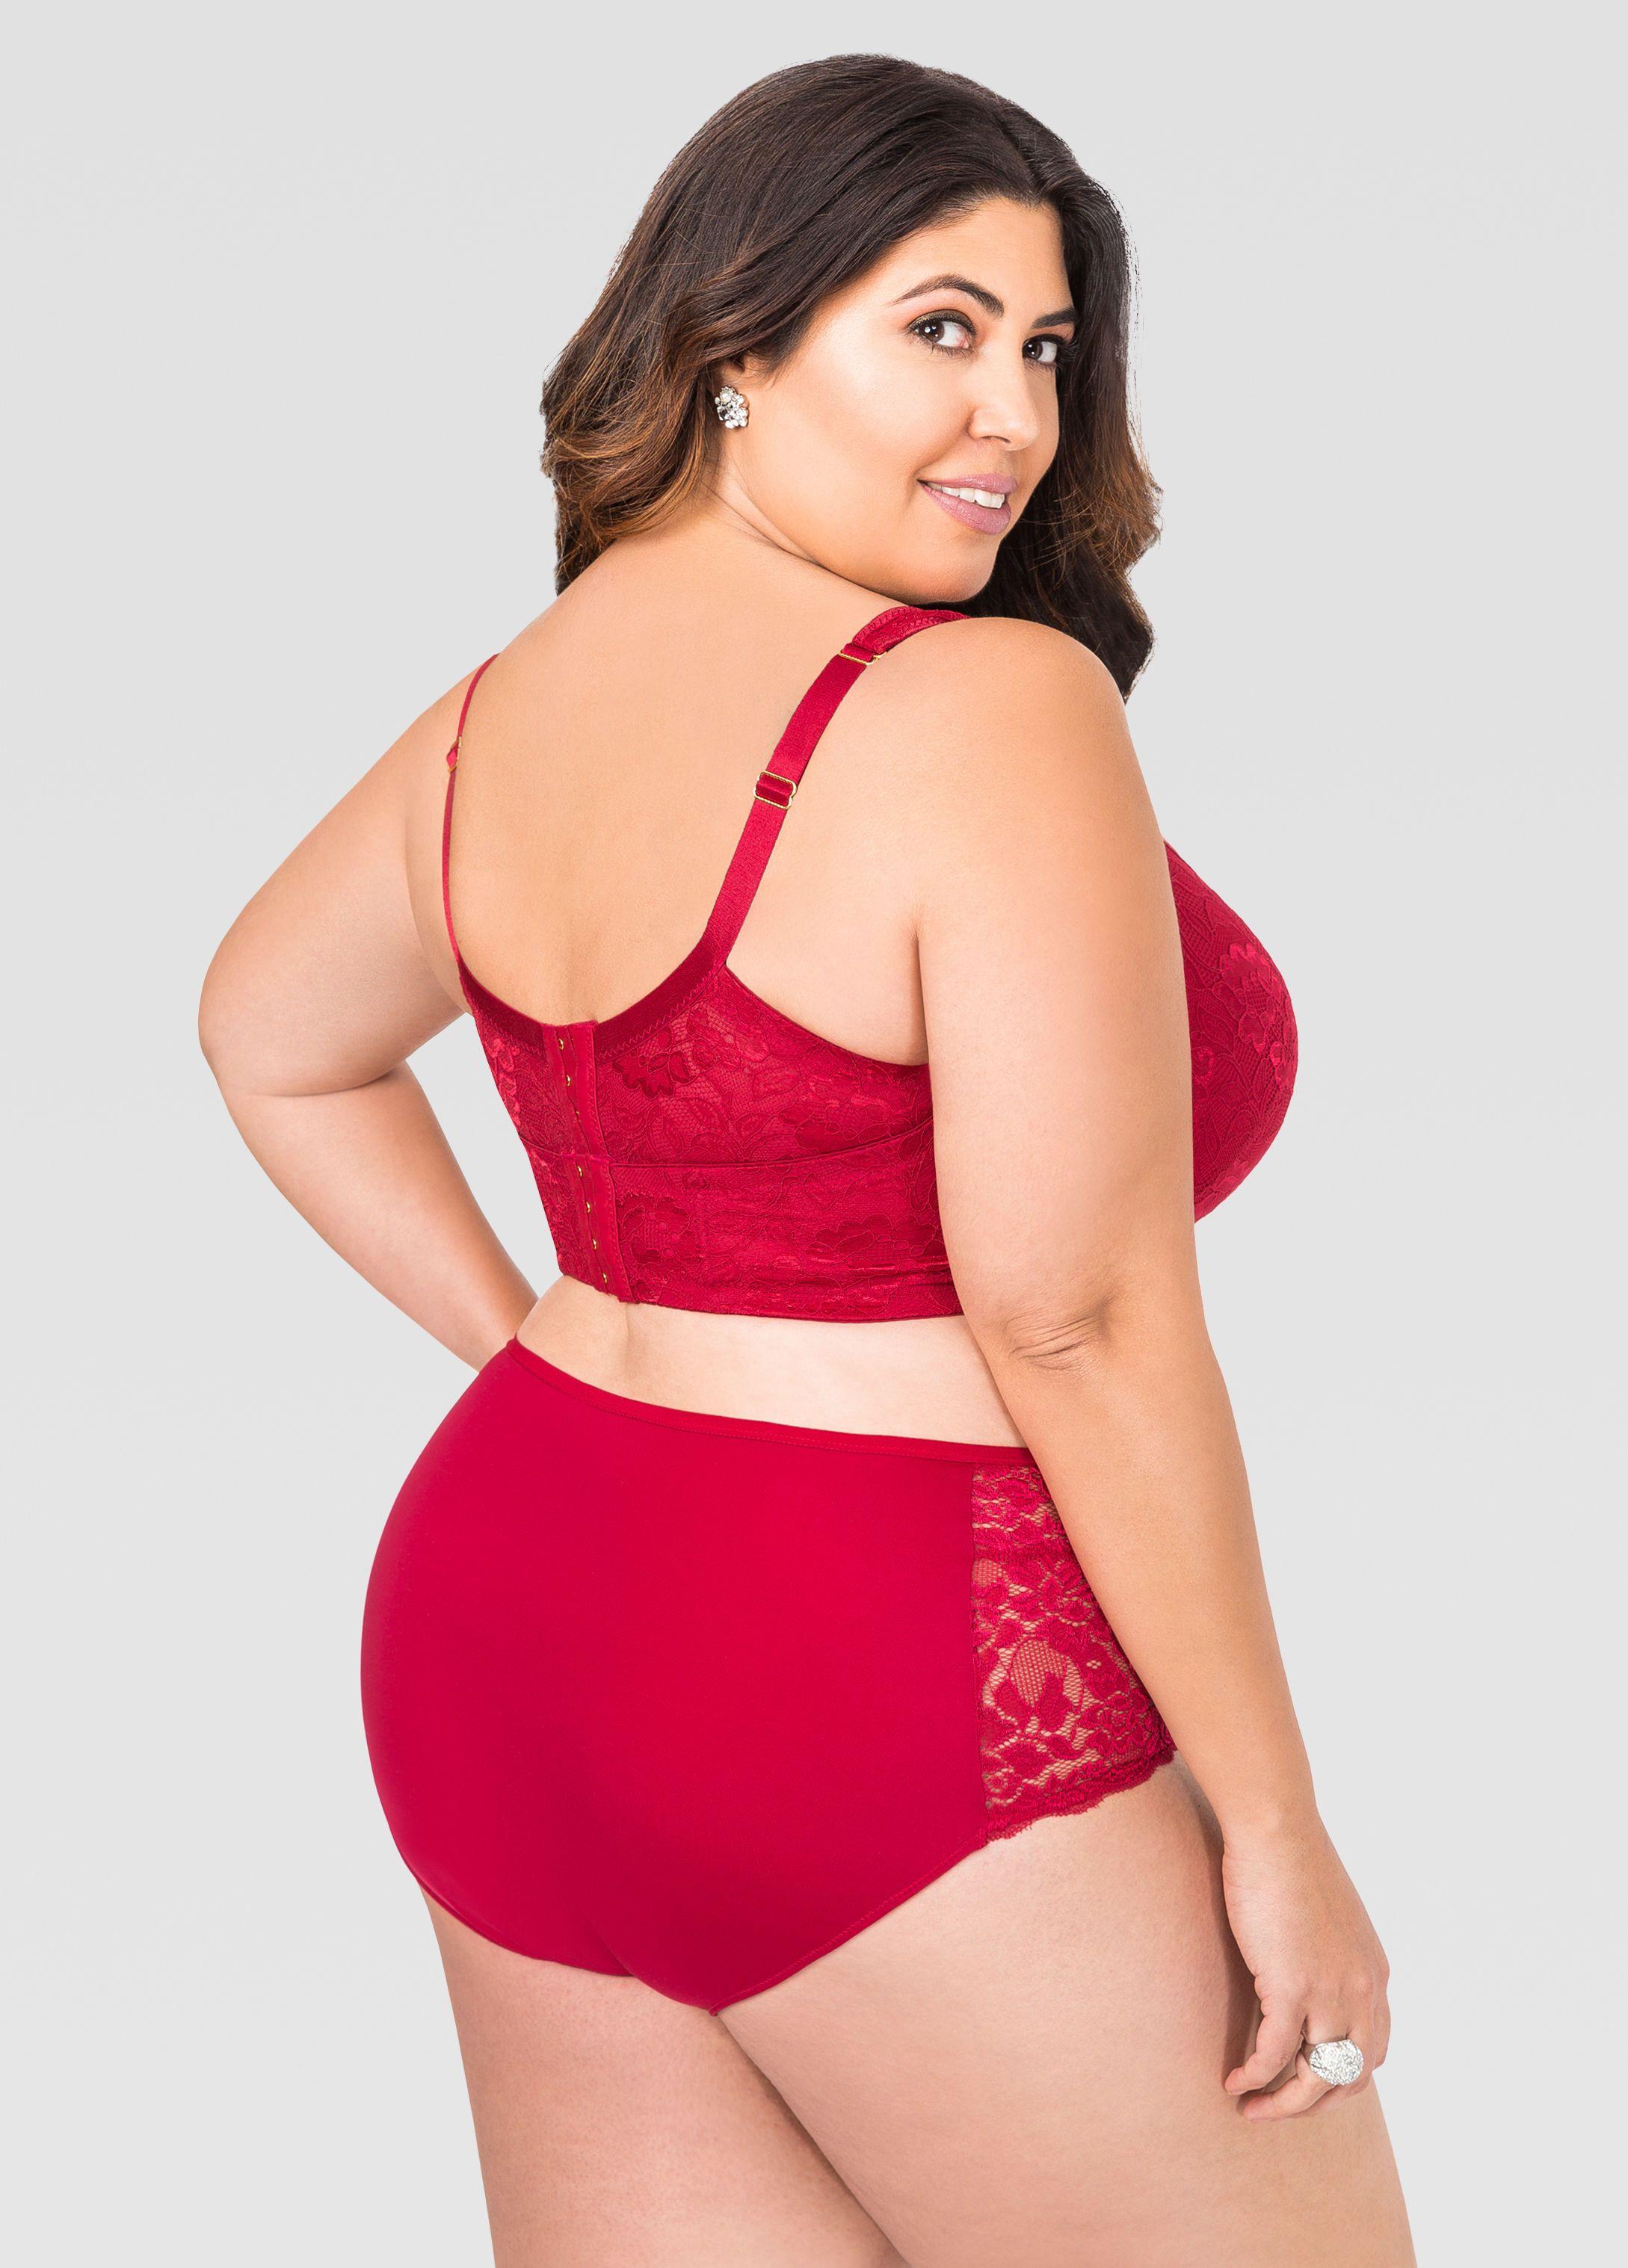 e0b5a2f853 Lace Plunge Butterfly Bra - Ashley Stewart Plus Size Bra, Plus Size Model,  Plus